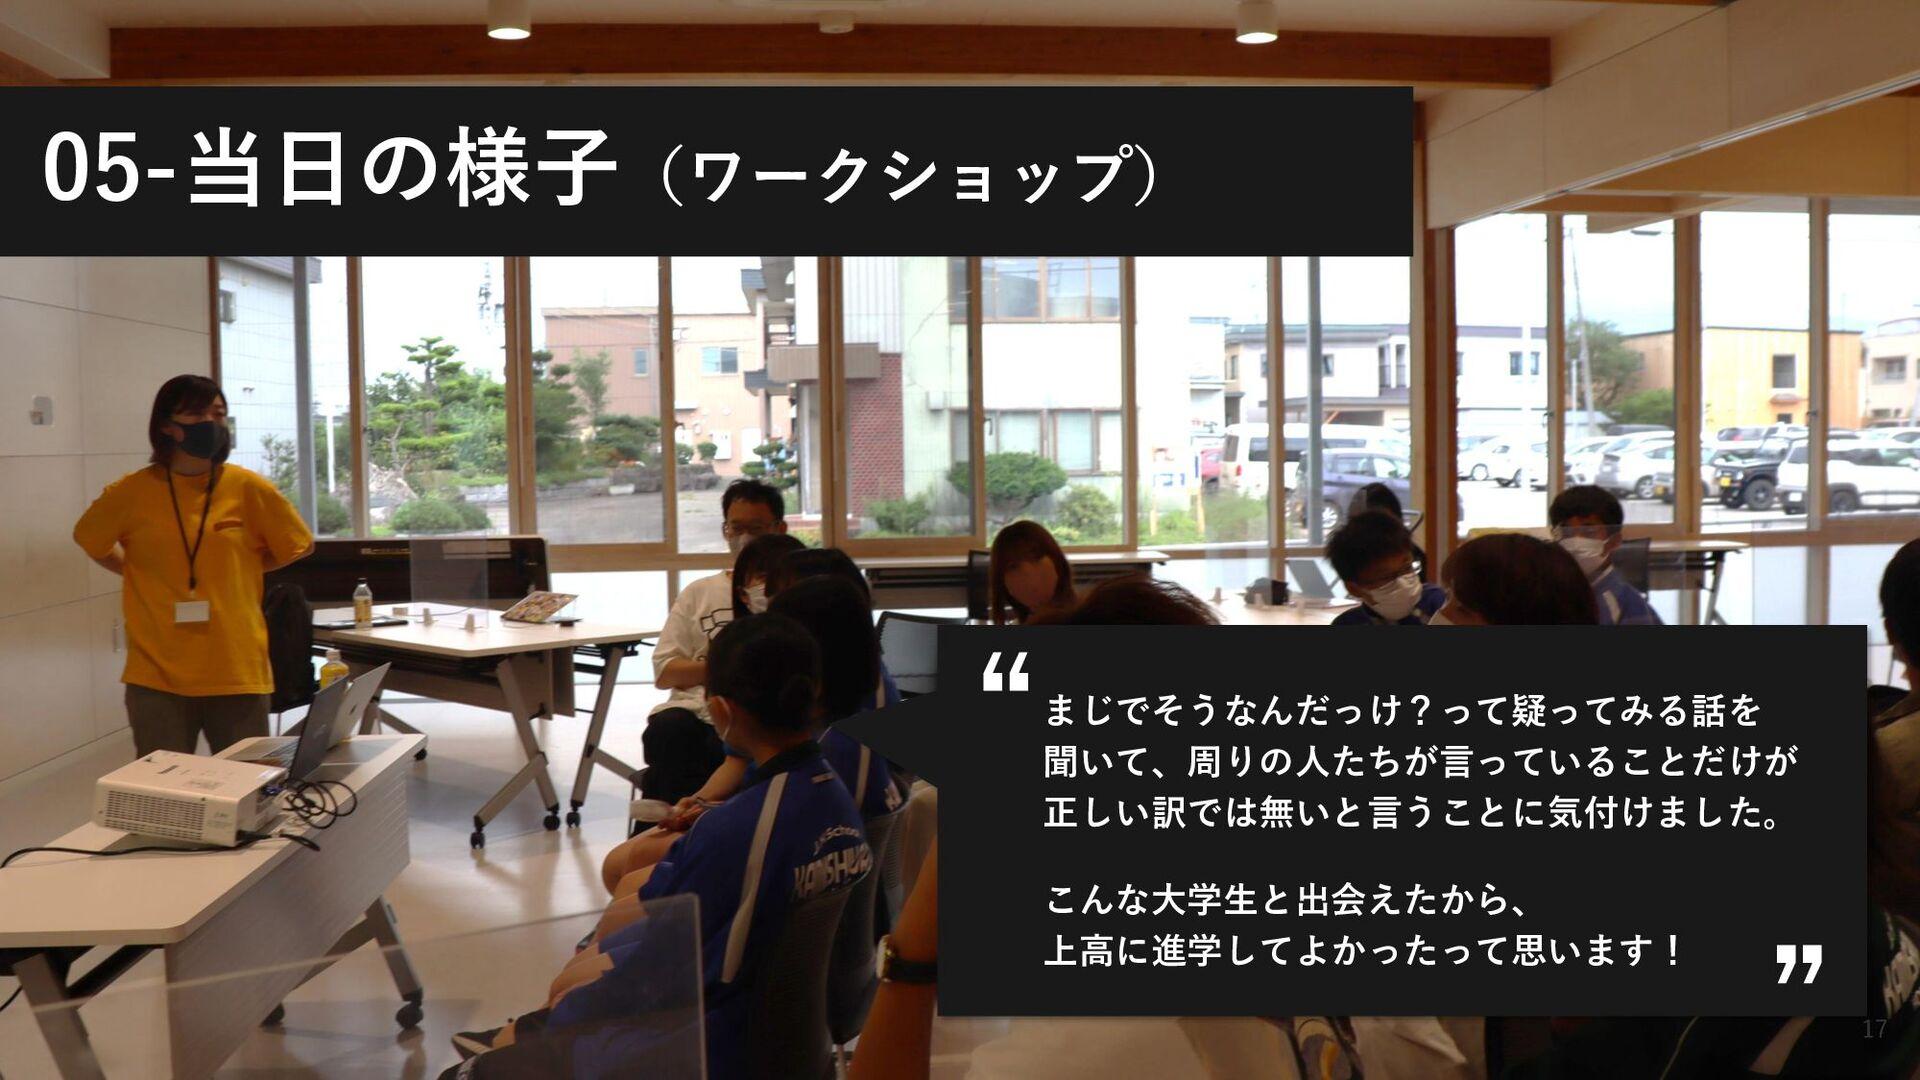 ©2021 Terakoya for tomorrow Inc. 17 05-当日の様子(ワー...